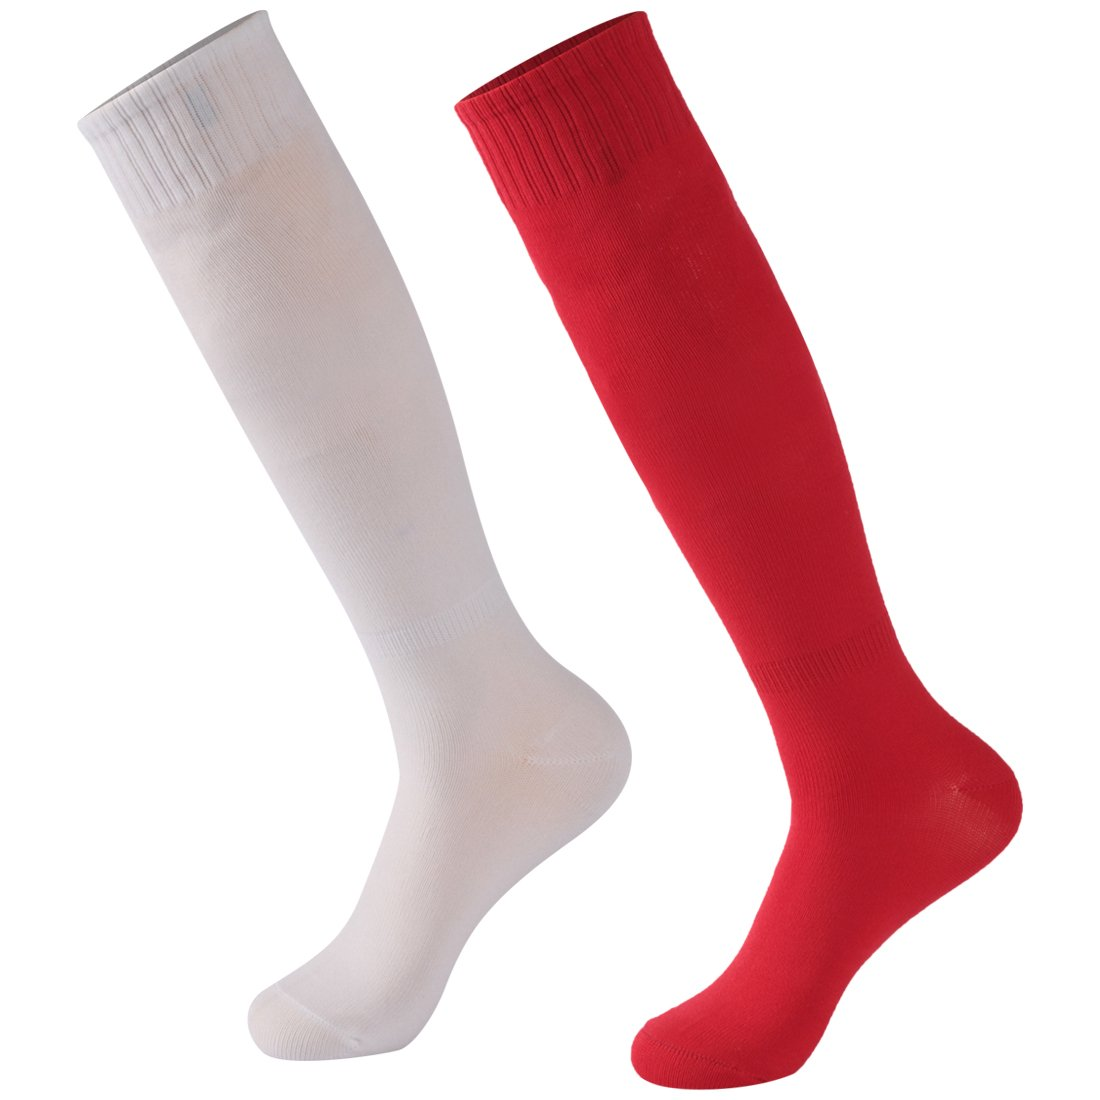 Calbom Funky Knee Socks, Dress Woman High Socks Solid Color Football Soccer Team Sports Tube Long School Uniform Festive Cosplay Socks 2 Pairs White/Black Gift for Students by Calbom